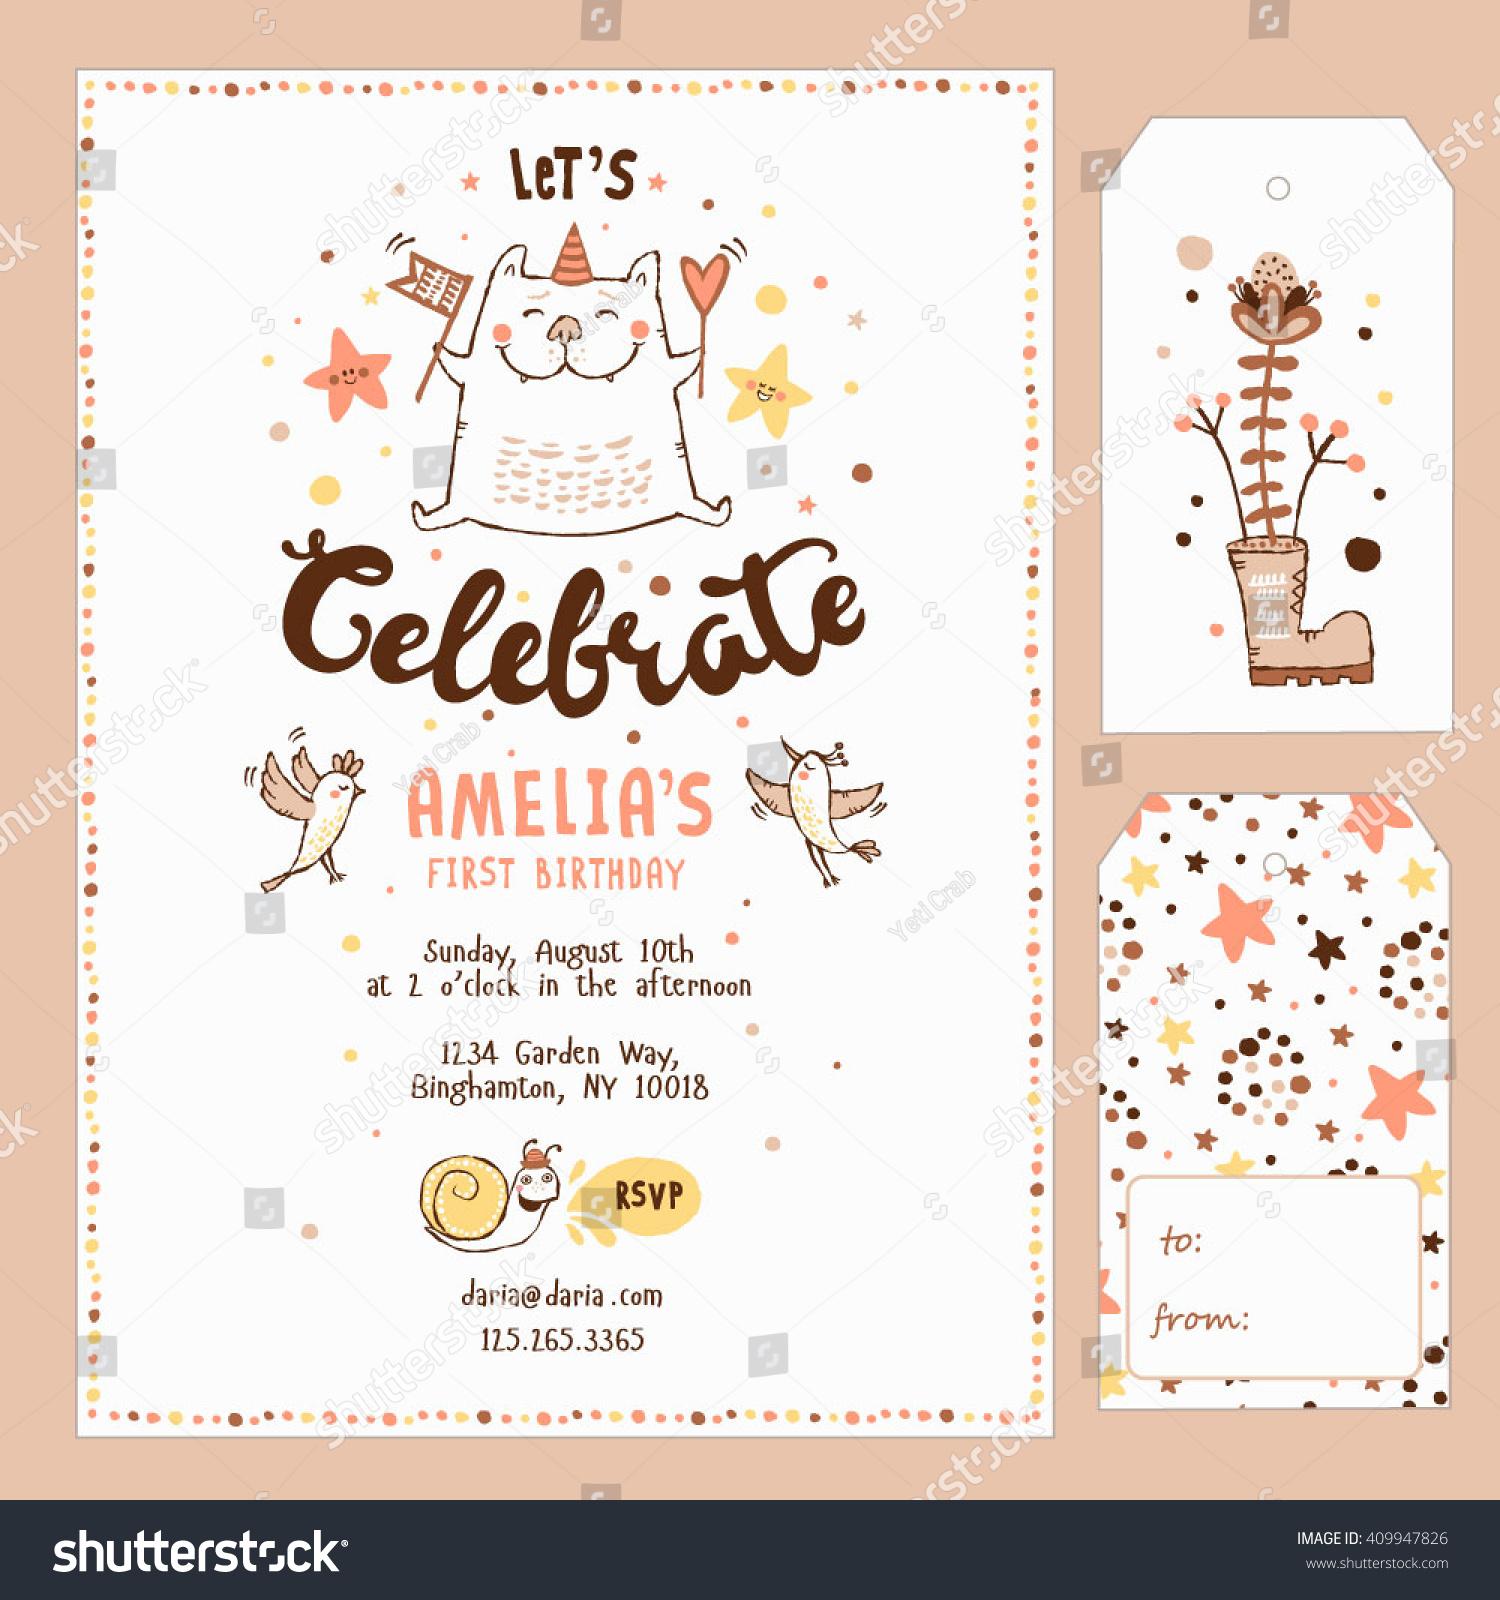 Gift Tags Birthday Invitation Card Birthday Stock Vector HD (Royalty ...